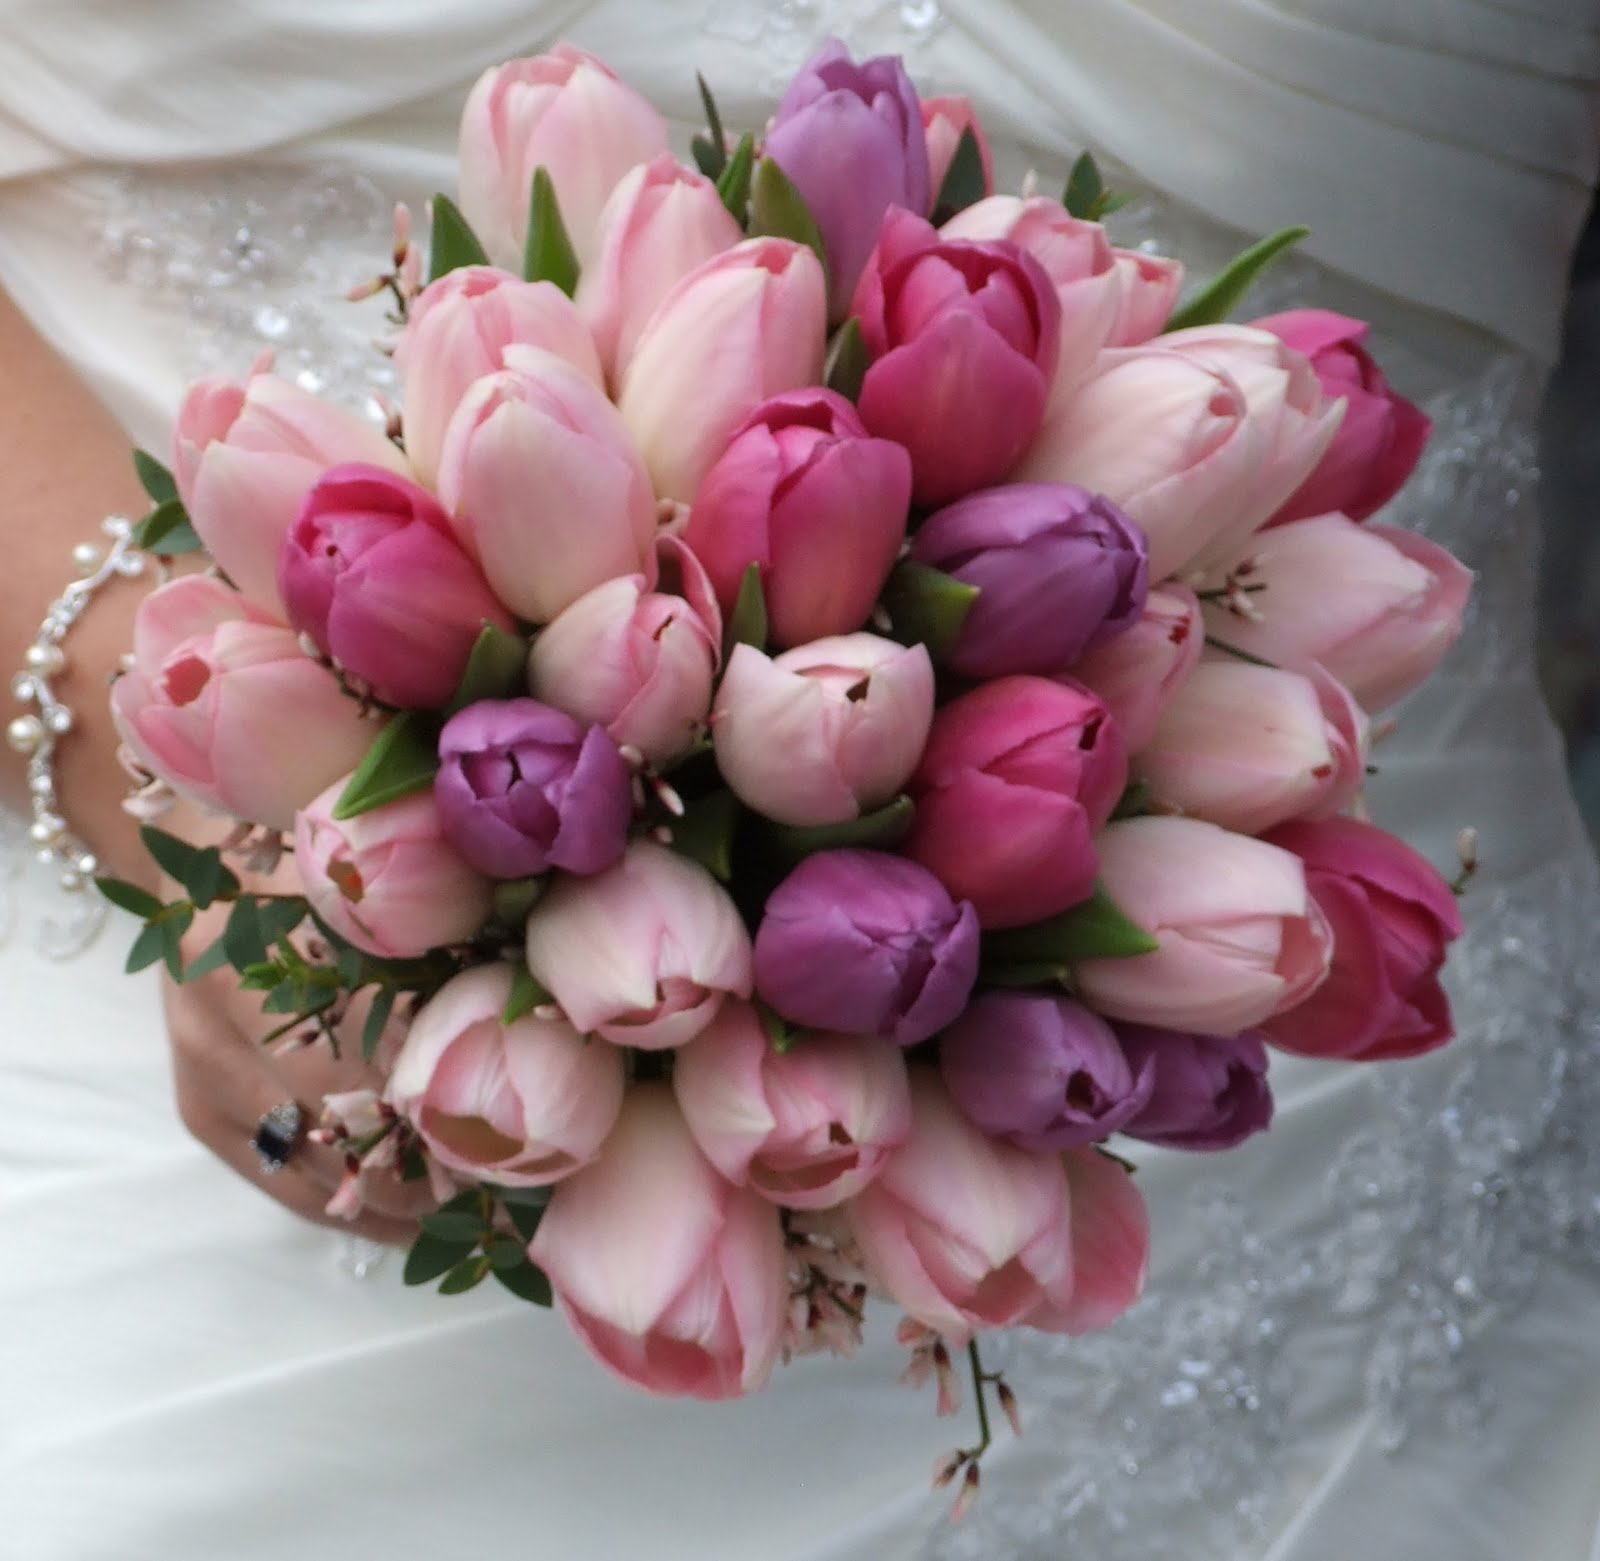 Wedding Bouquet Crystal Flowers: Crystal Flowers: Vibrant Tulip Wedding Bouquet's